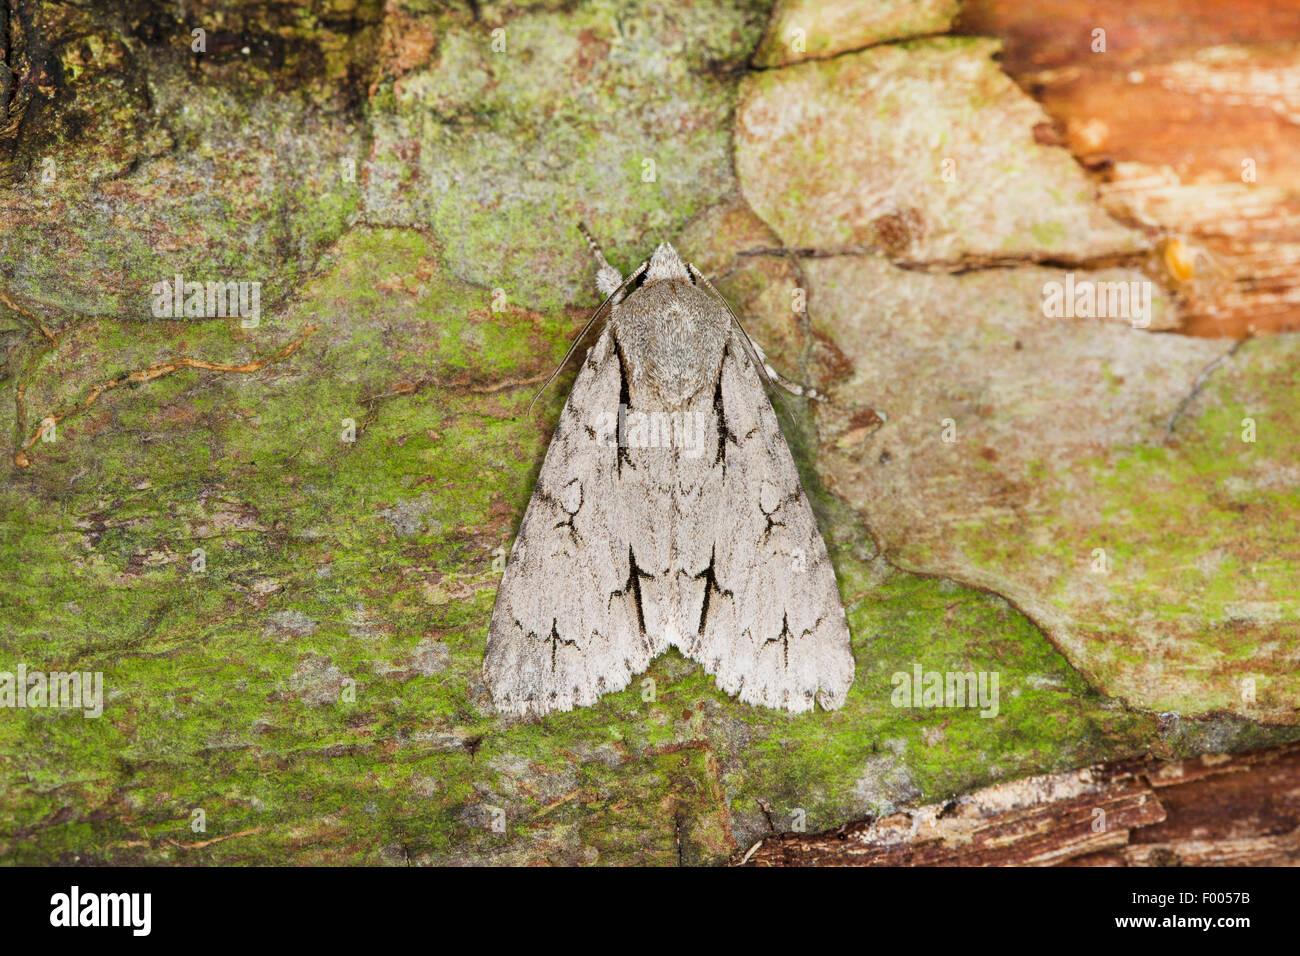 Grey dagger, Grey dagger moth (Acronicta psi), on bark, Germany - Stock Image